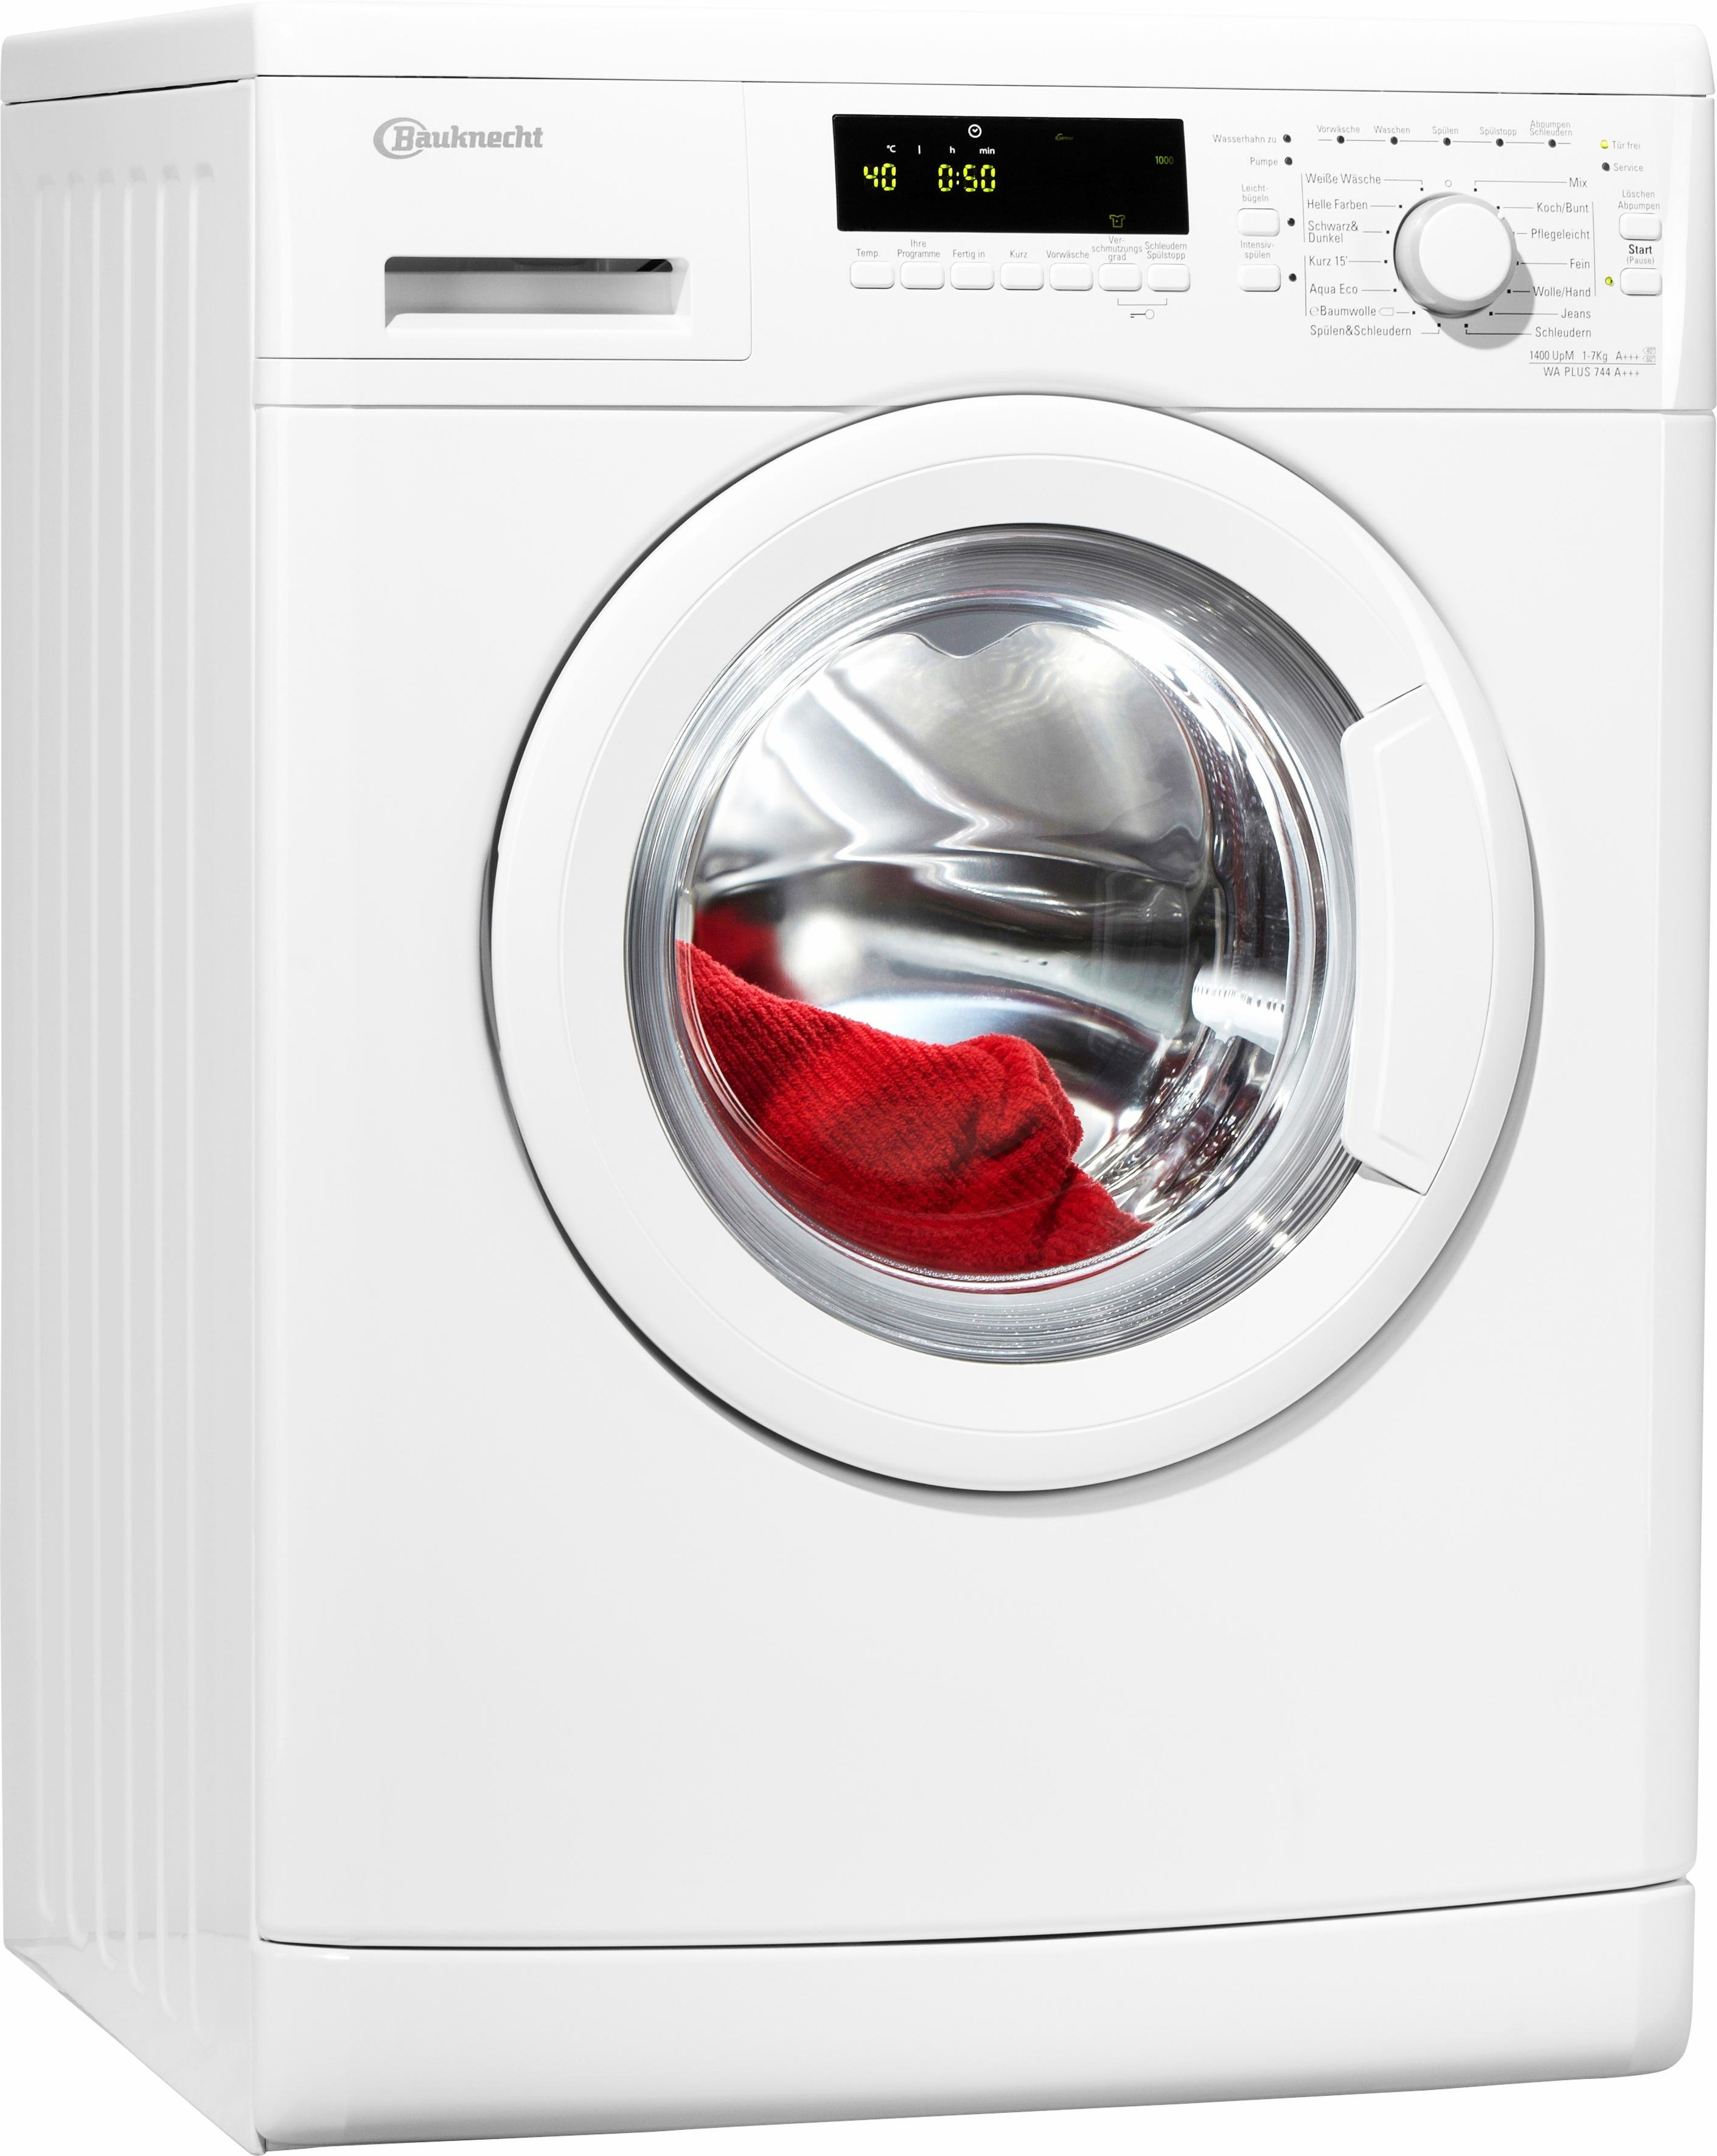 Bauknecht wasmachine WA PLUS 744 A+++, A+++, 7 kg, 1400 tpm nu online kopen bij OTTO